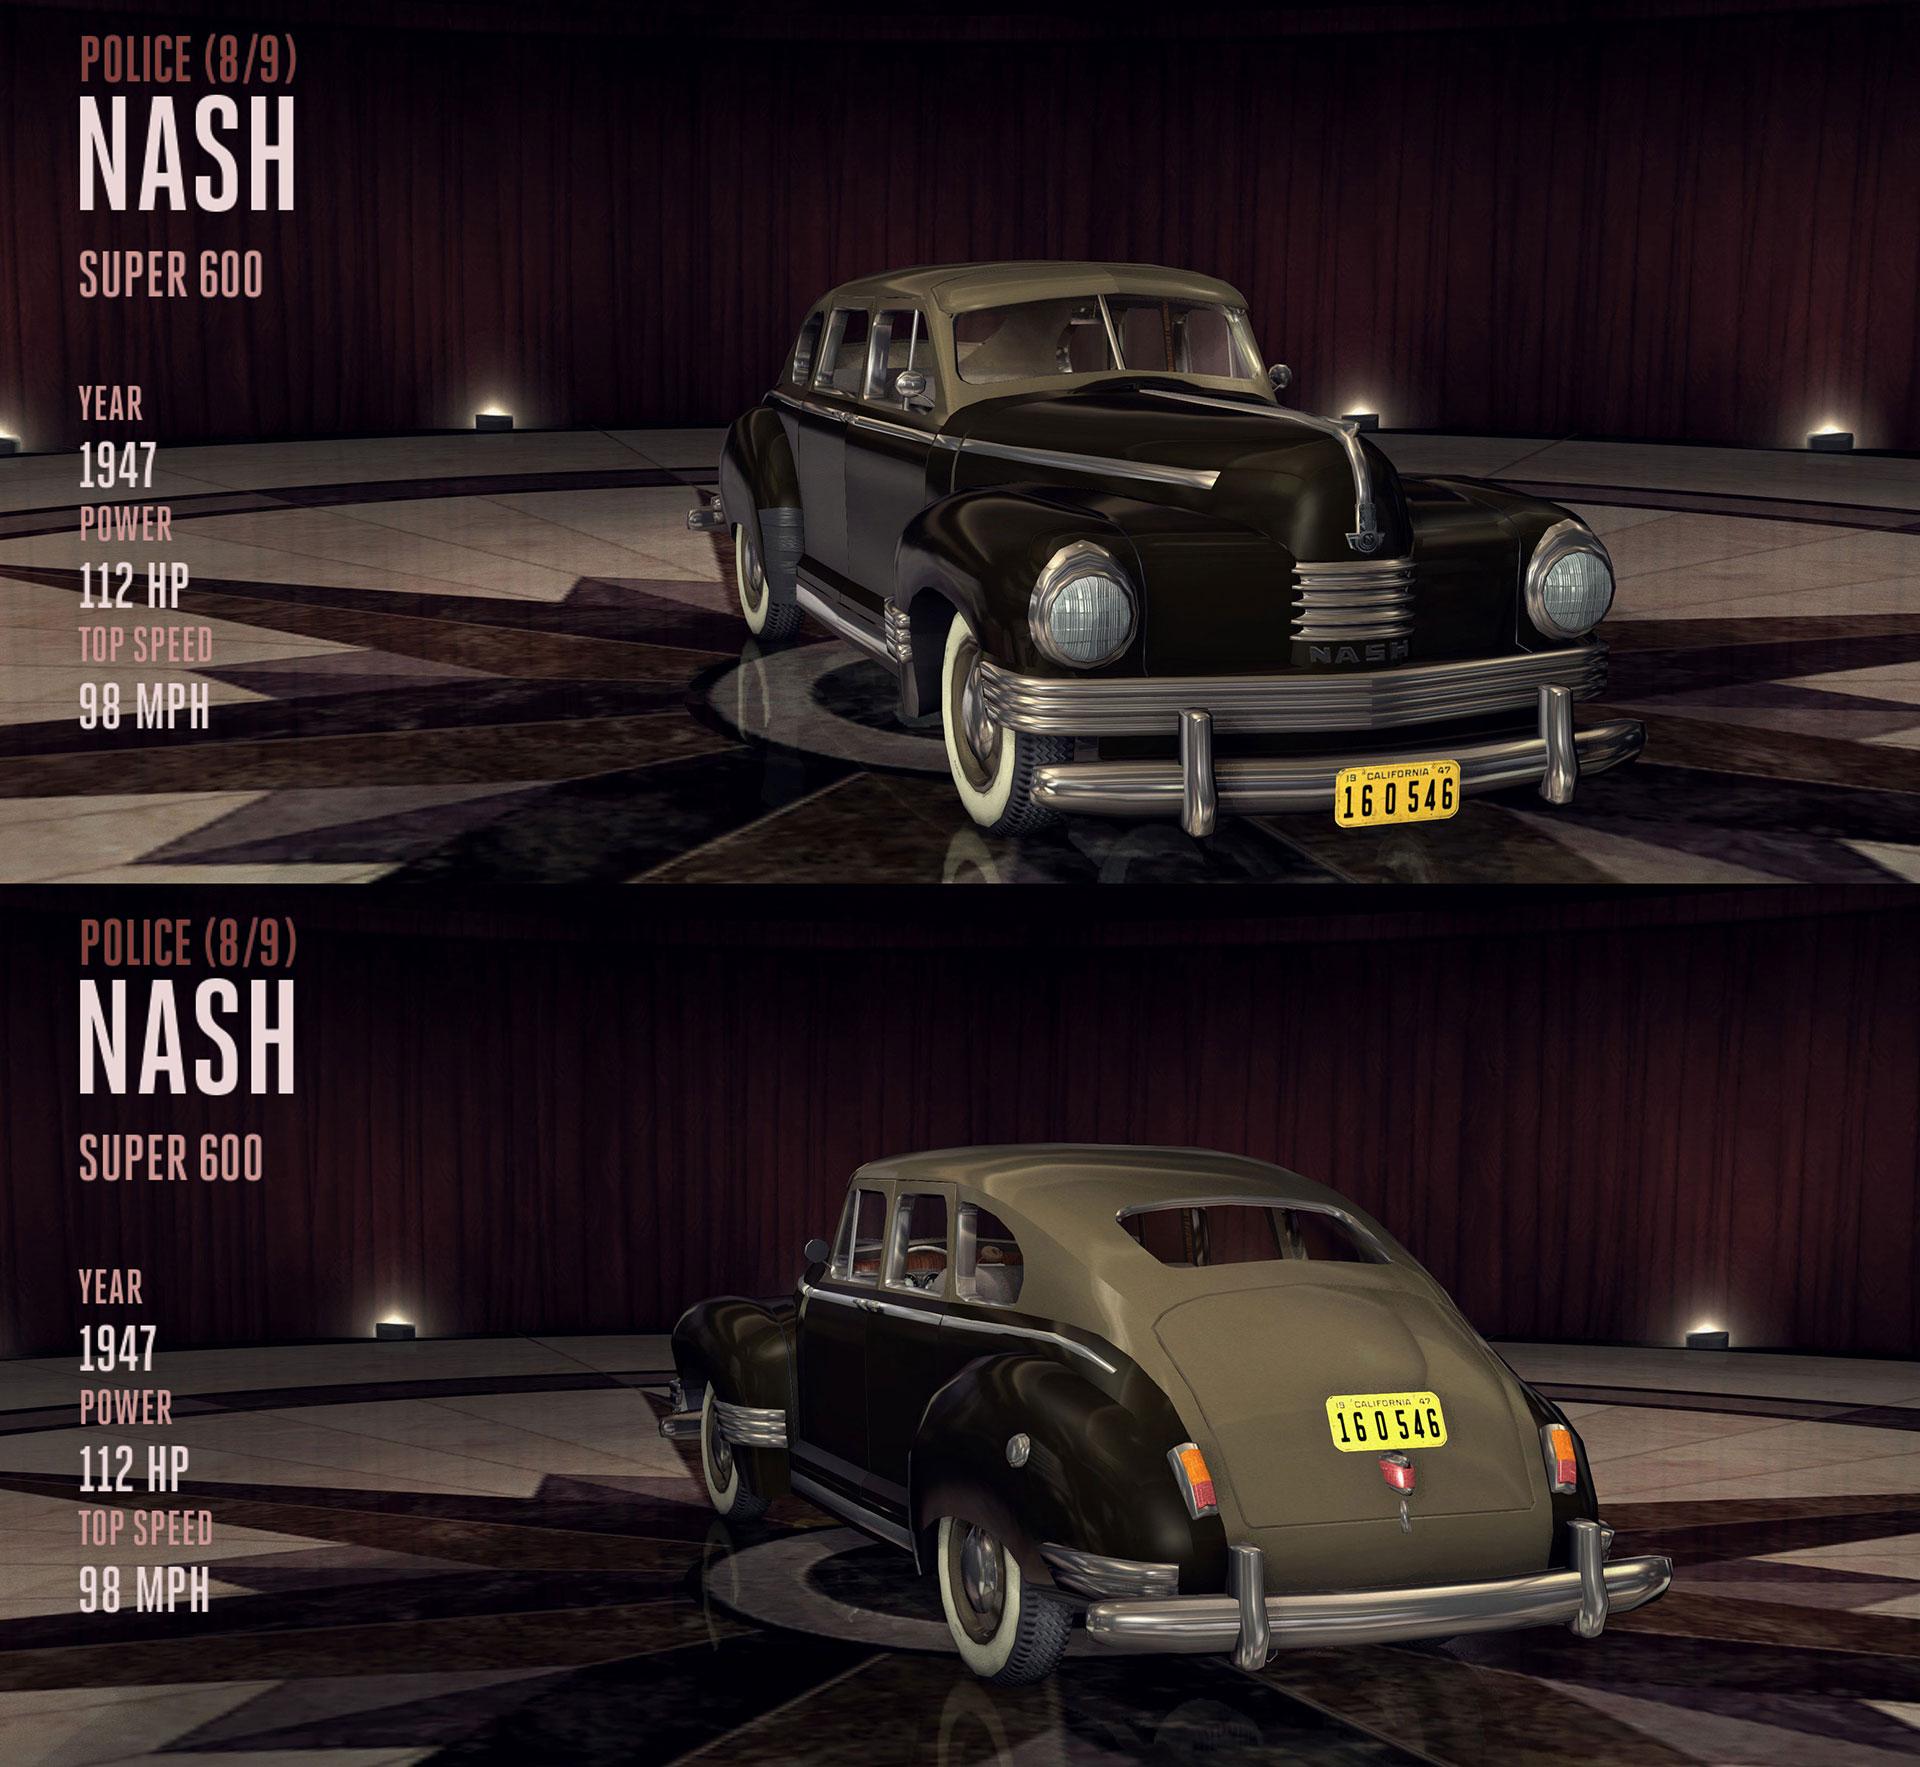 Nash Super 600 (Police)